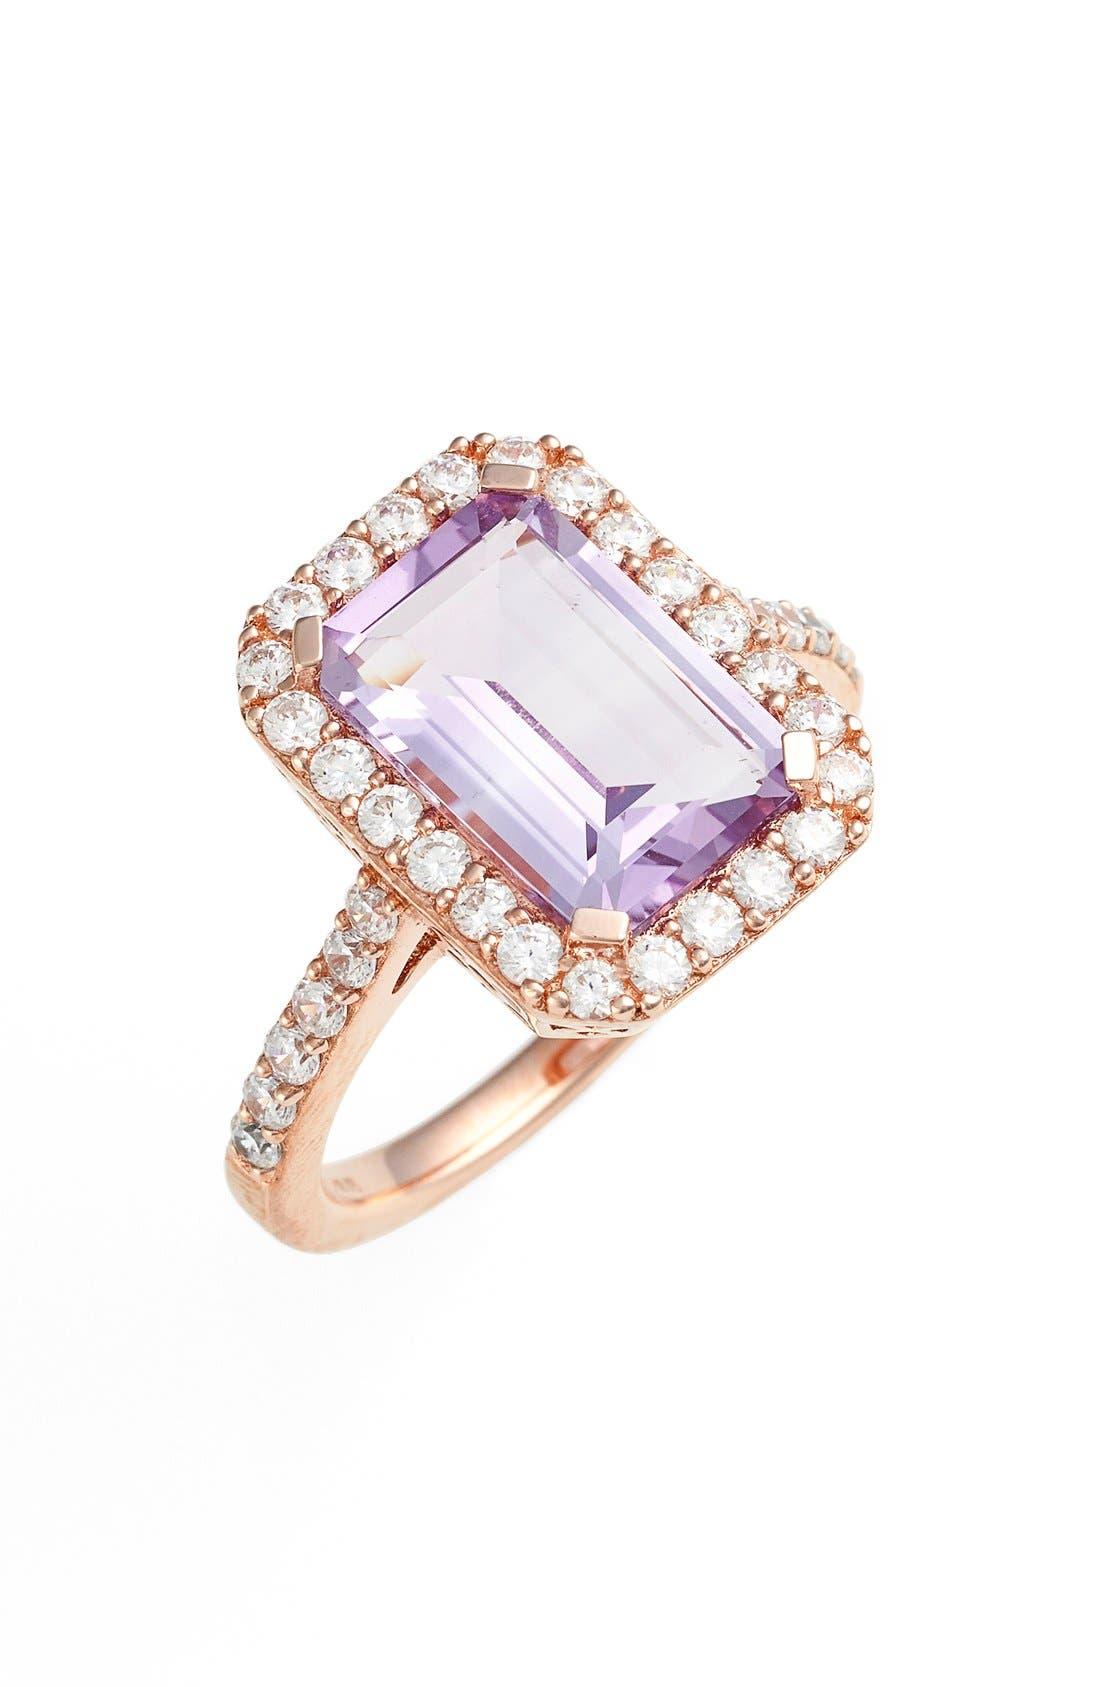 'Aria' Emerald Cut Ring,                         Main,                         color, Rose Gold/ Amethyst